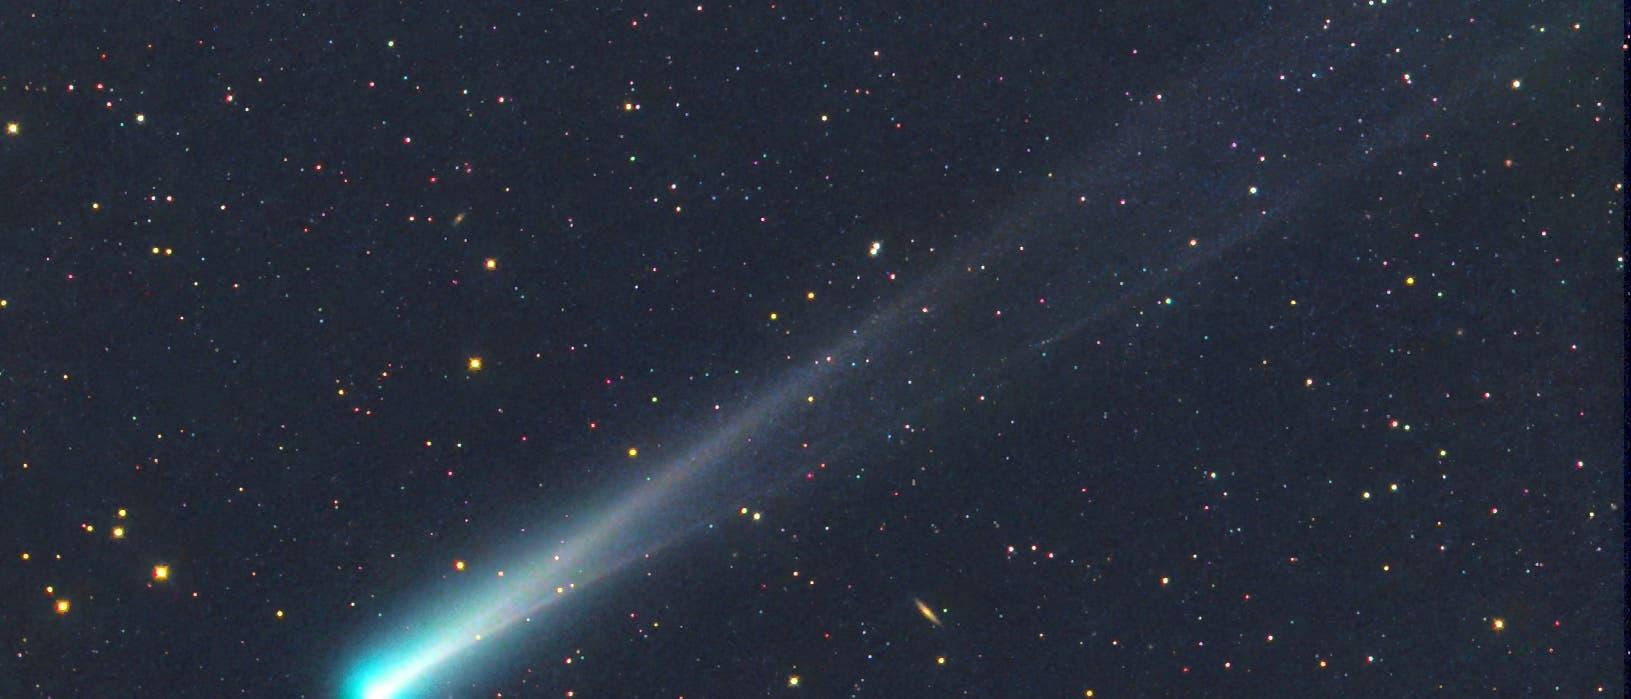 Komet ISON am 12. November 2013